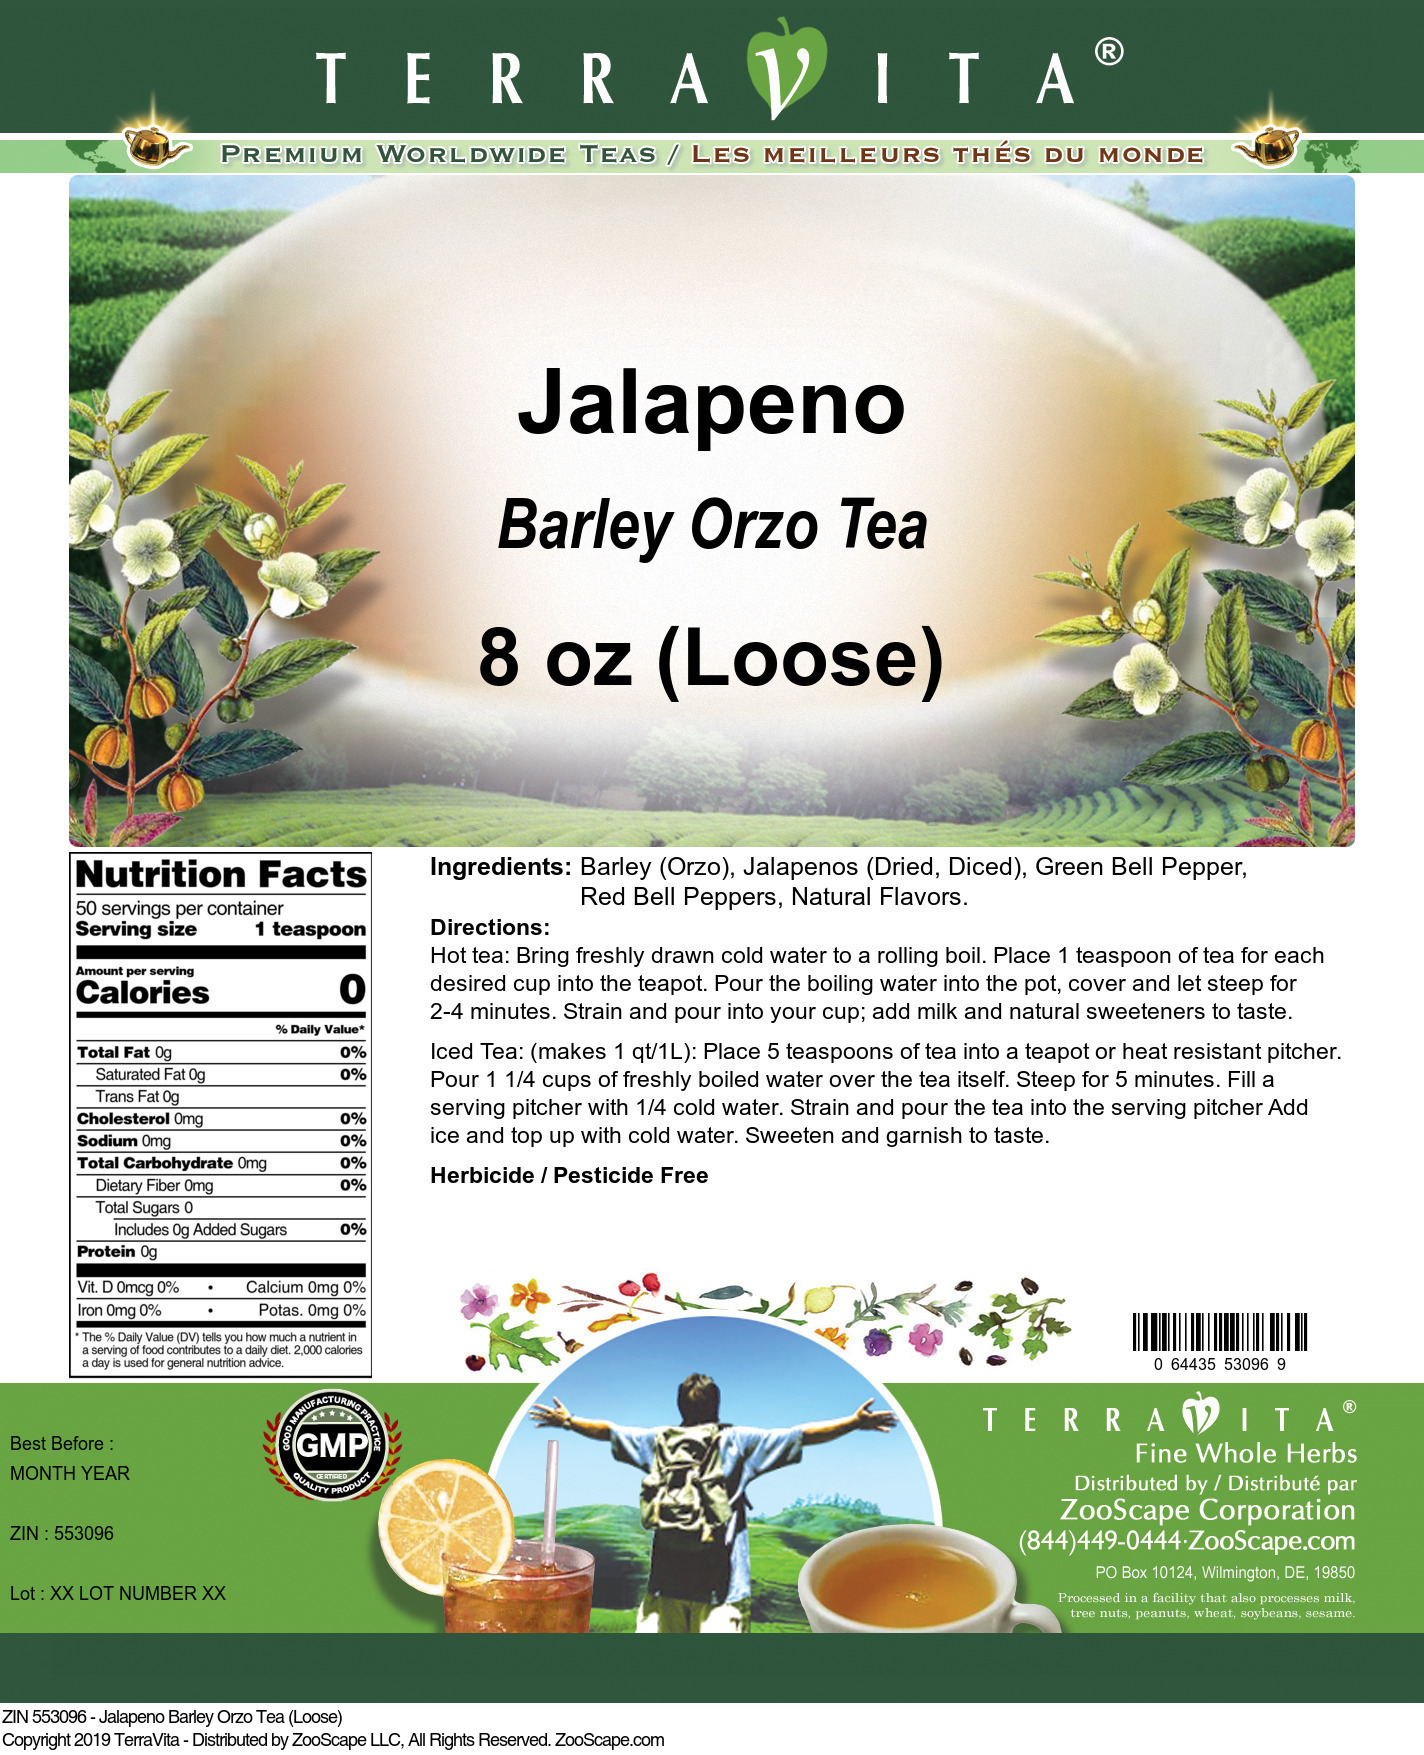 Jalapeno Barley Orzo Tea (Loose)